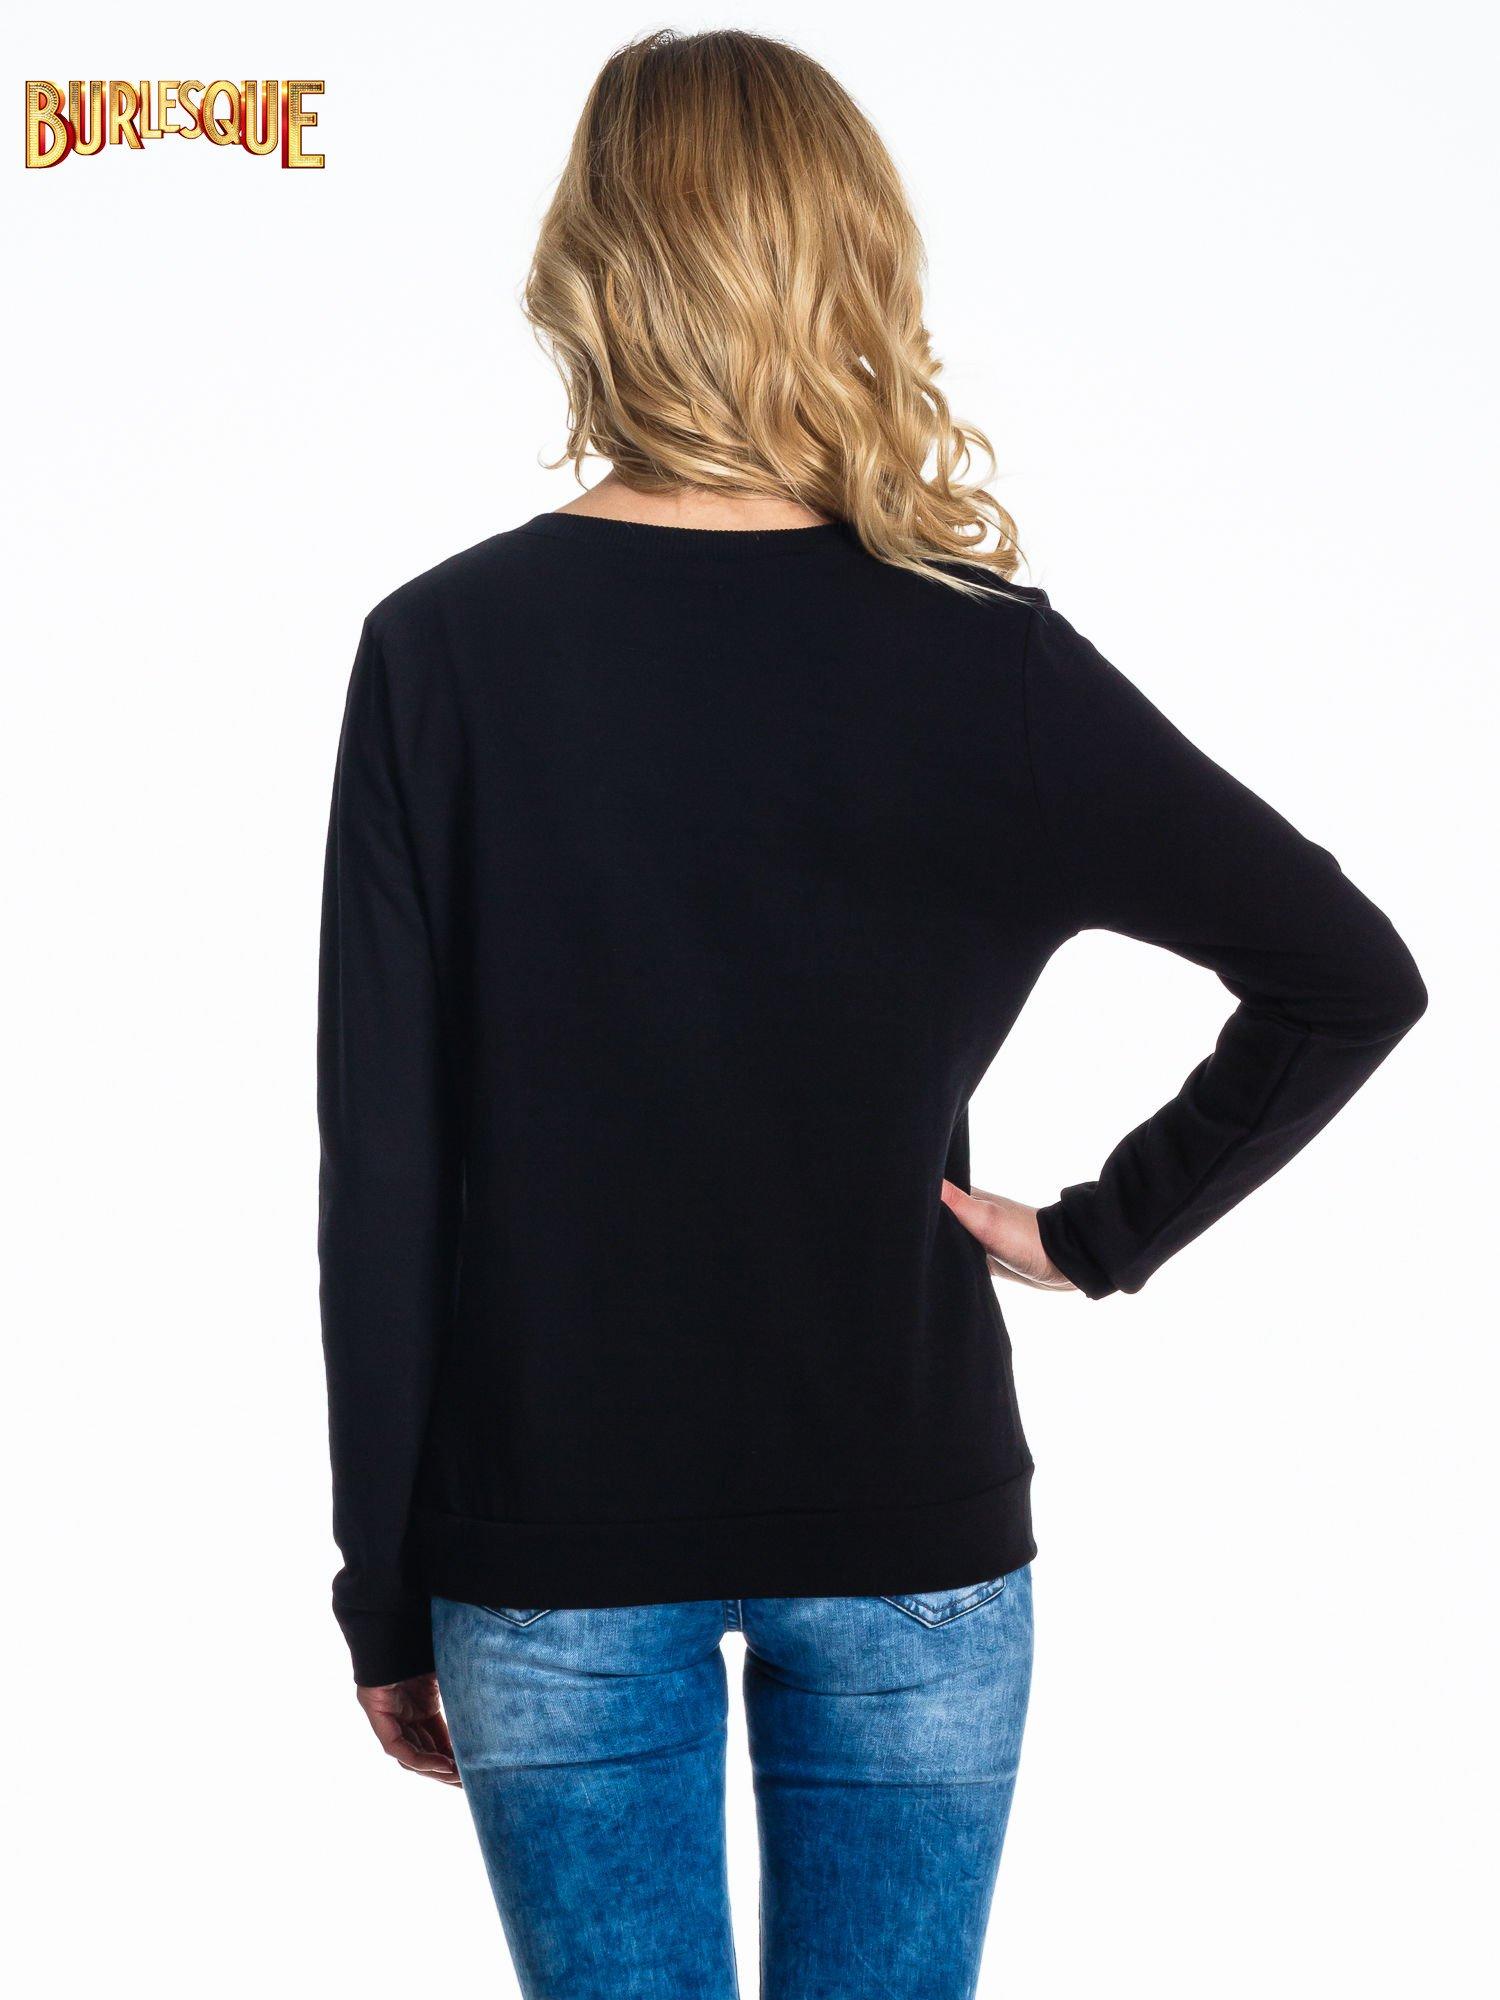 Czarna klasyczna bluza damska z napisem SORRY NOT SORRY                                  zdj.                                  4